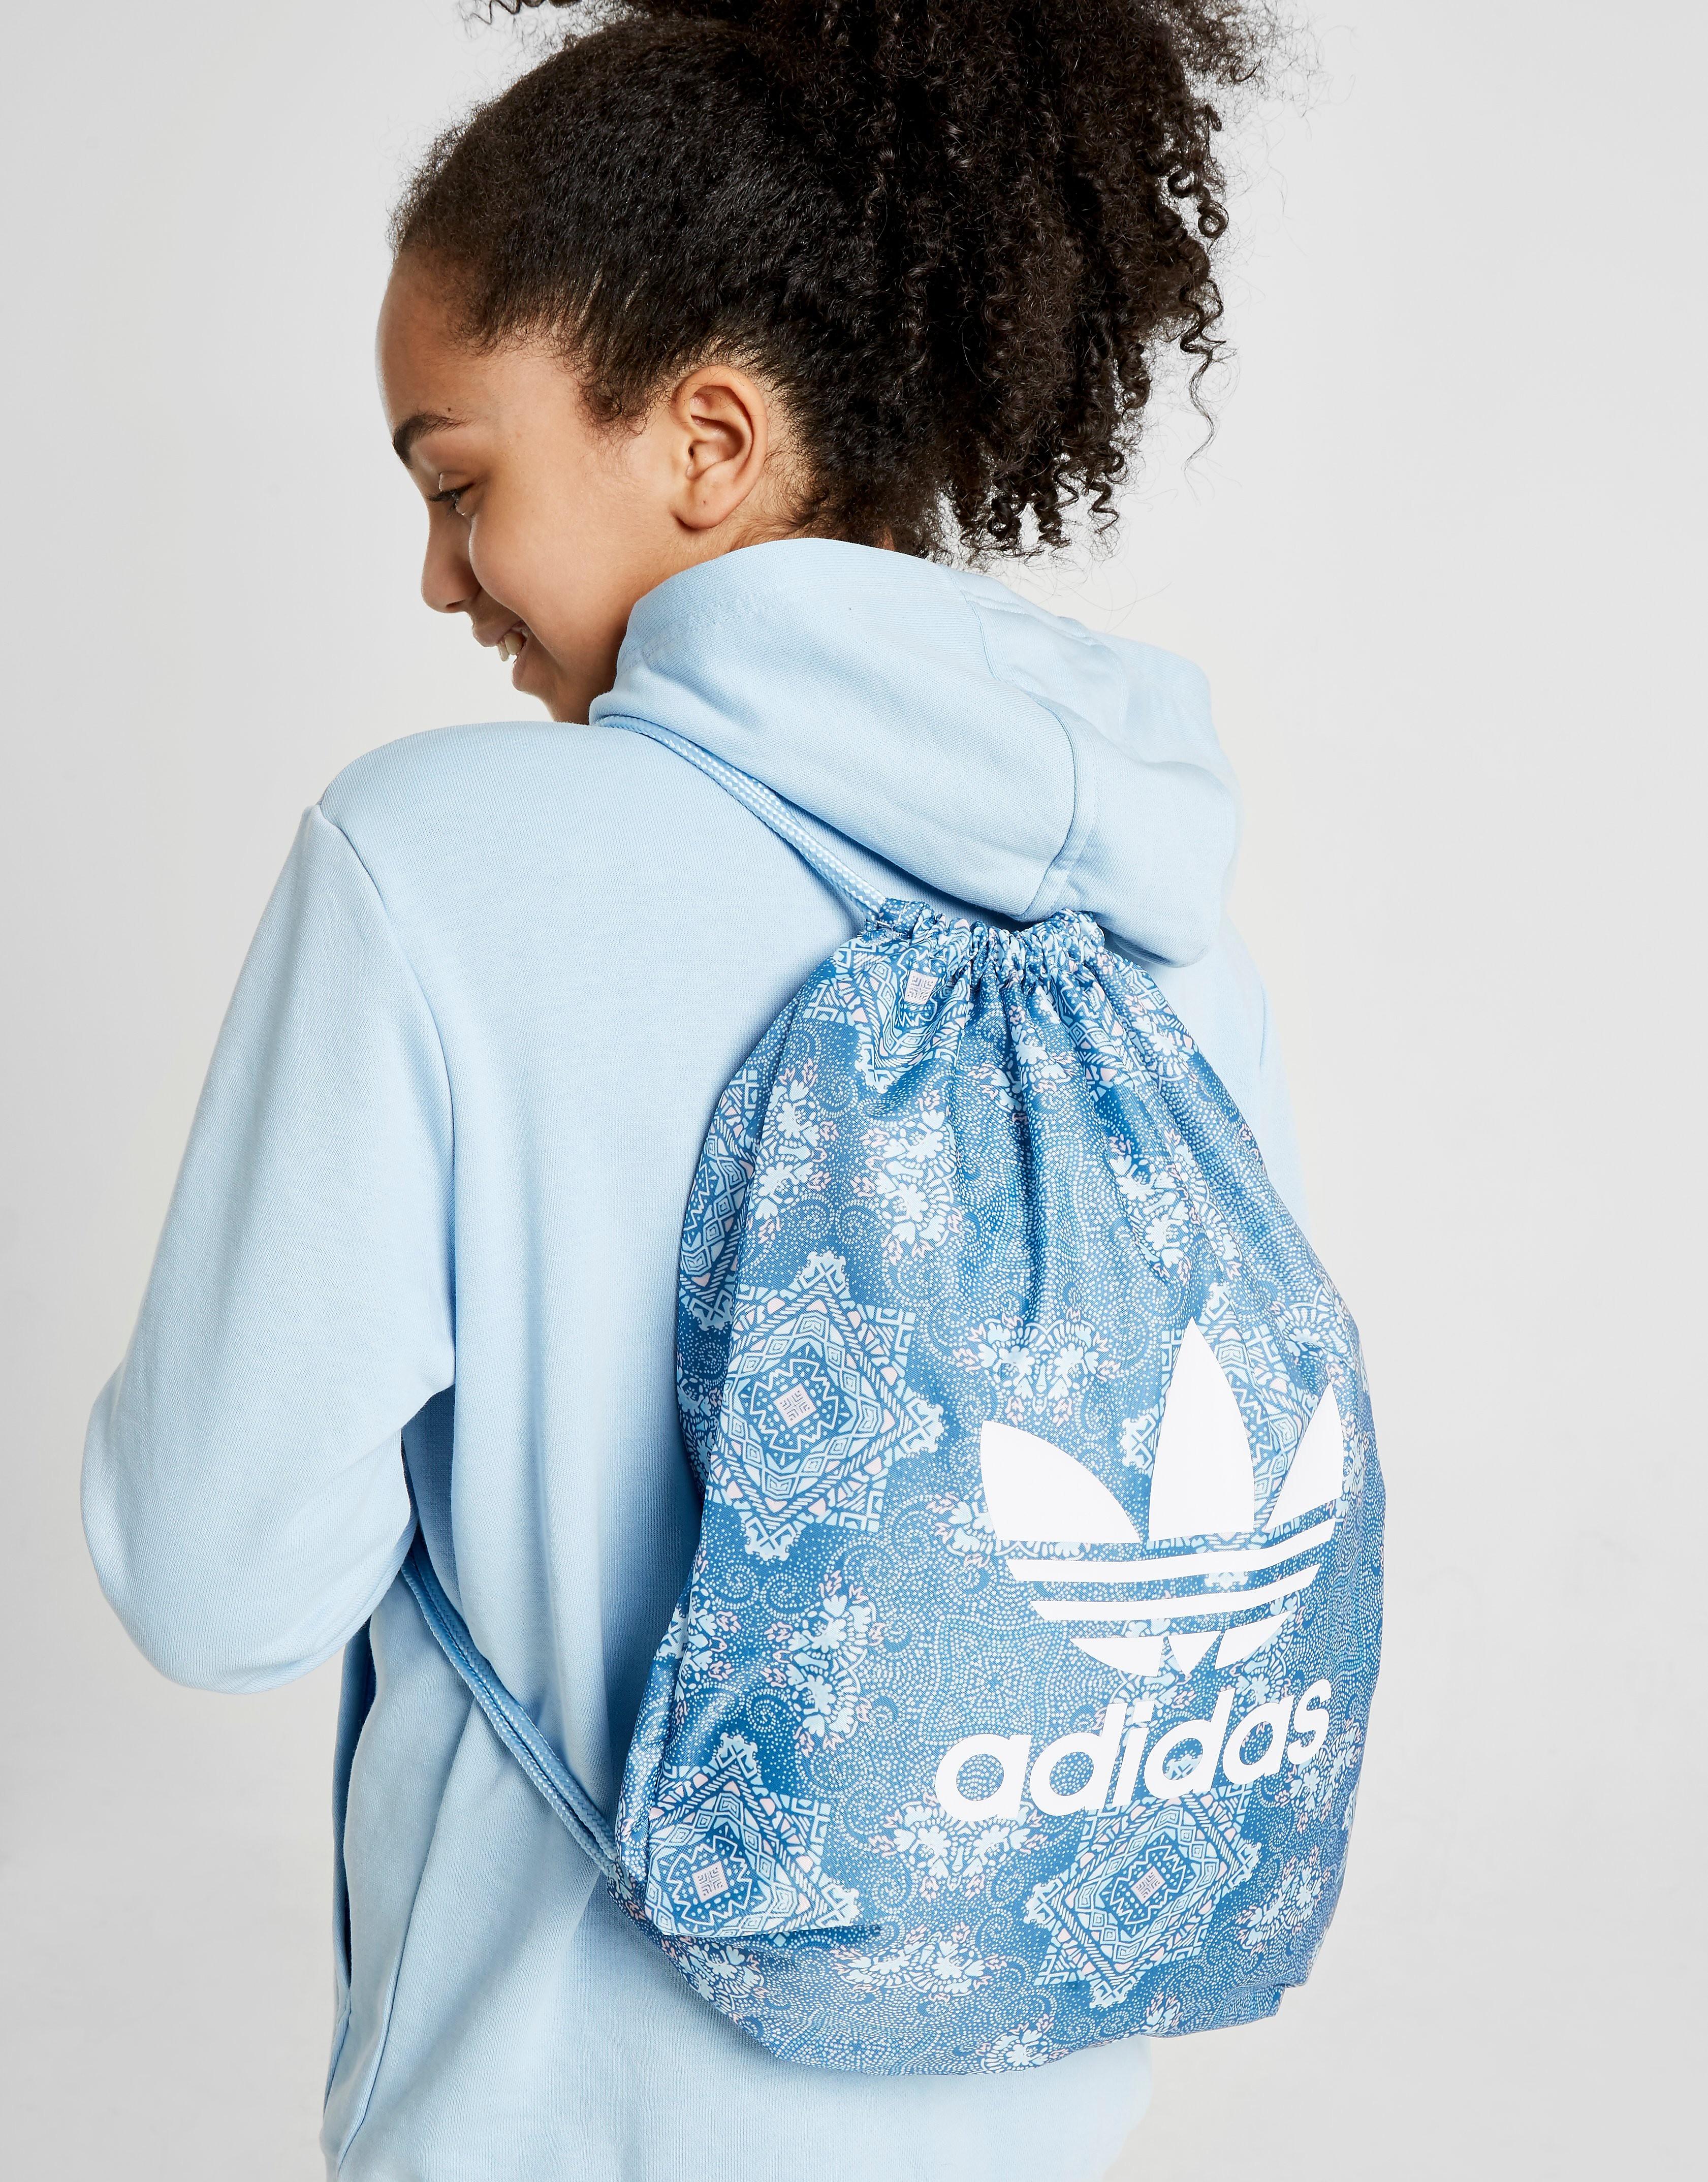 Adidas sporttas blauw en wit